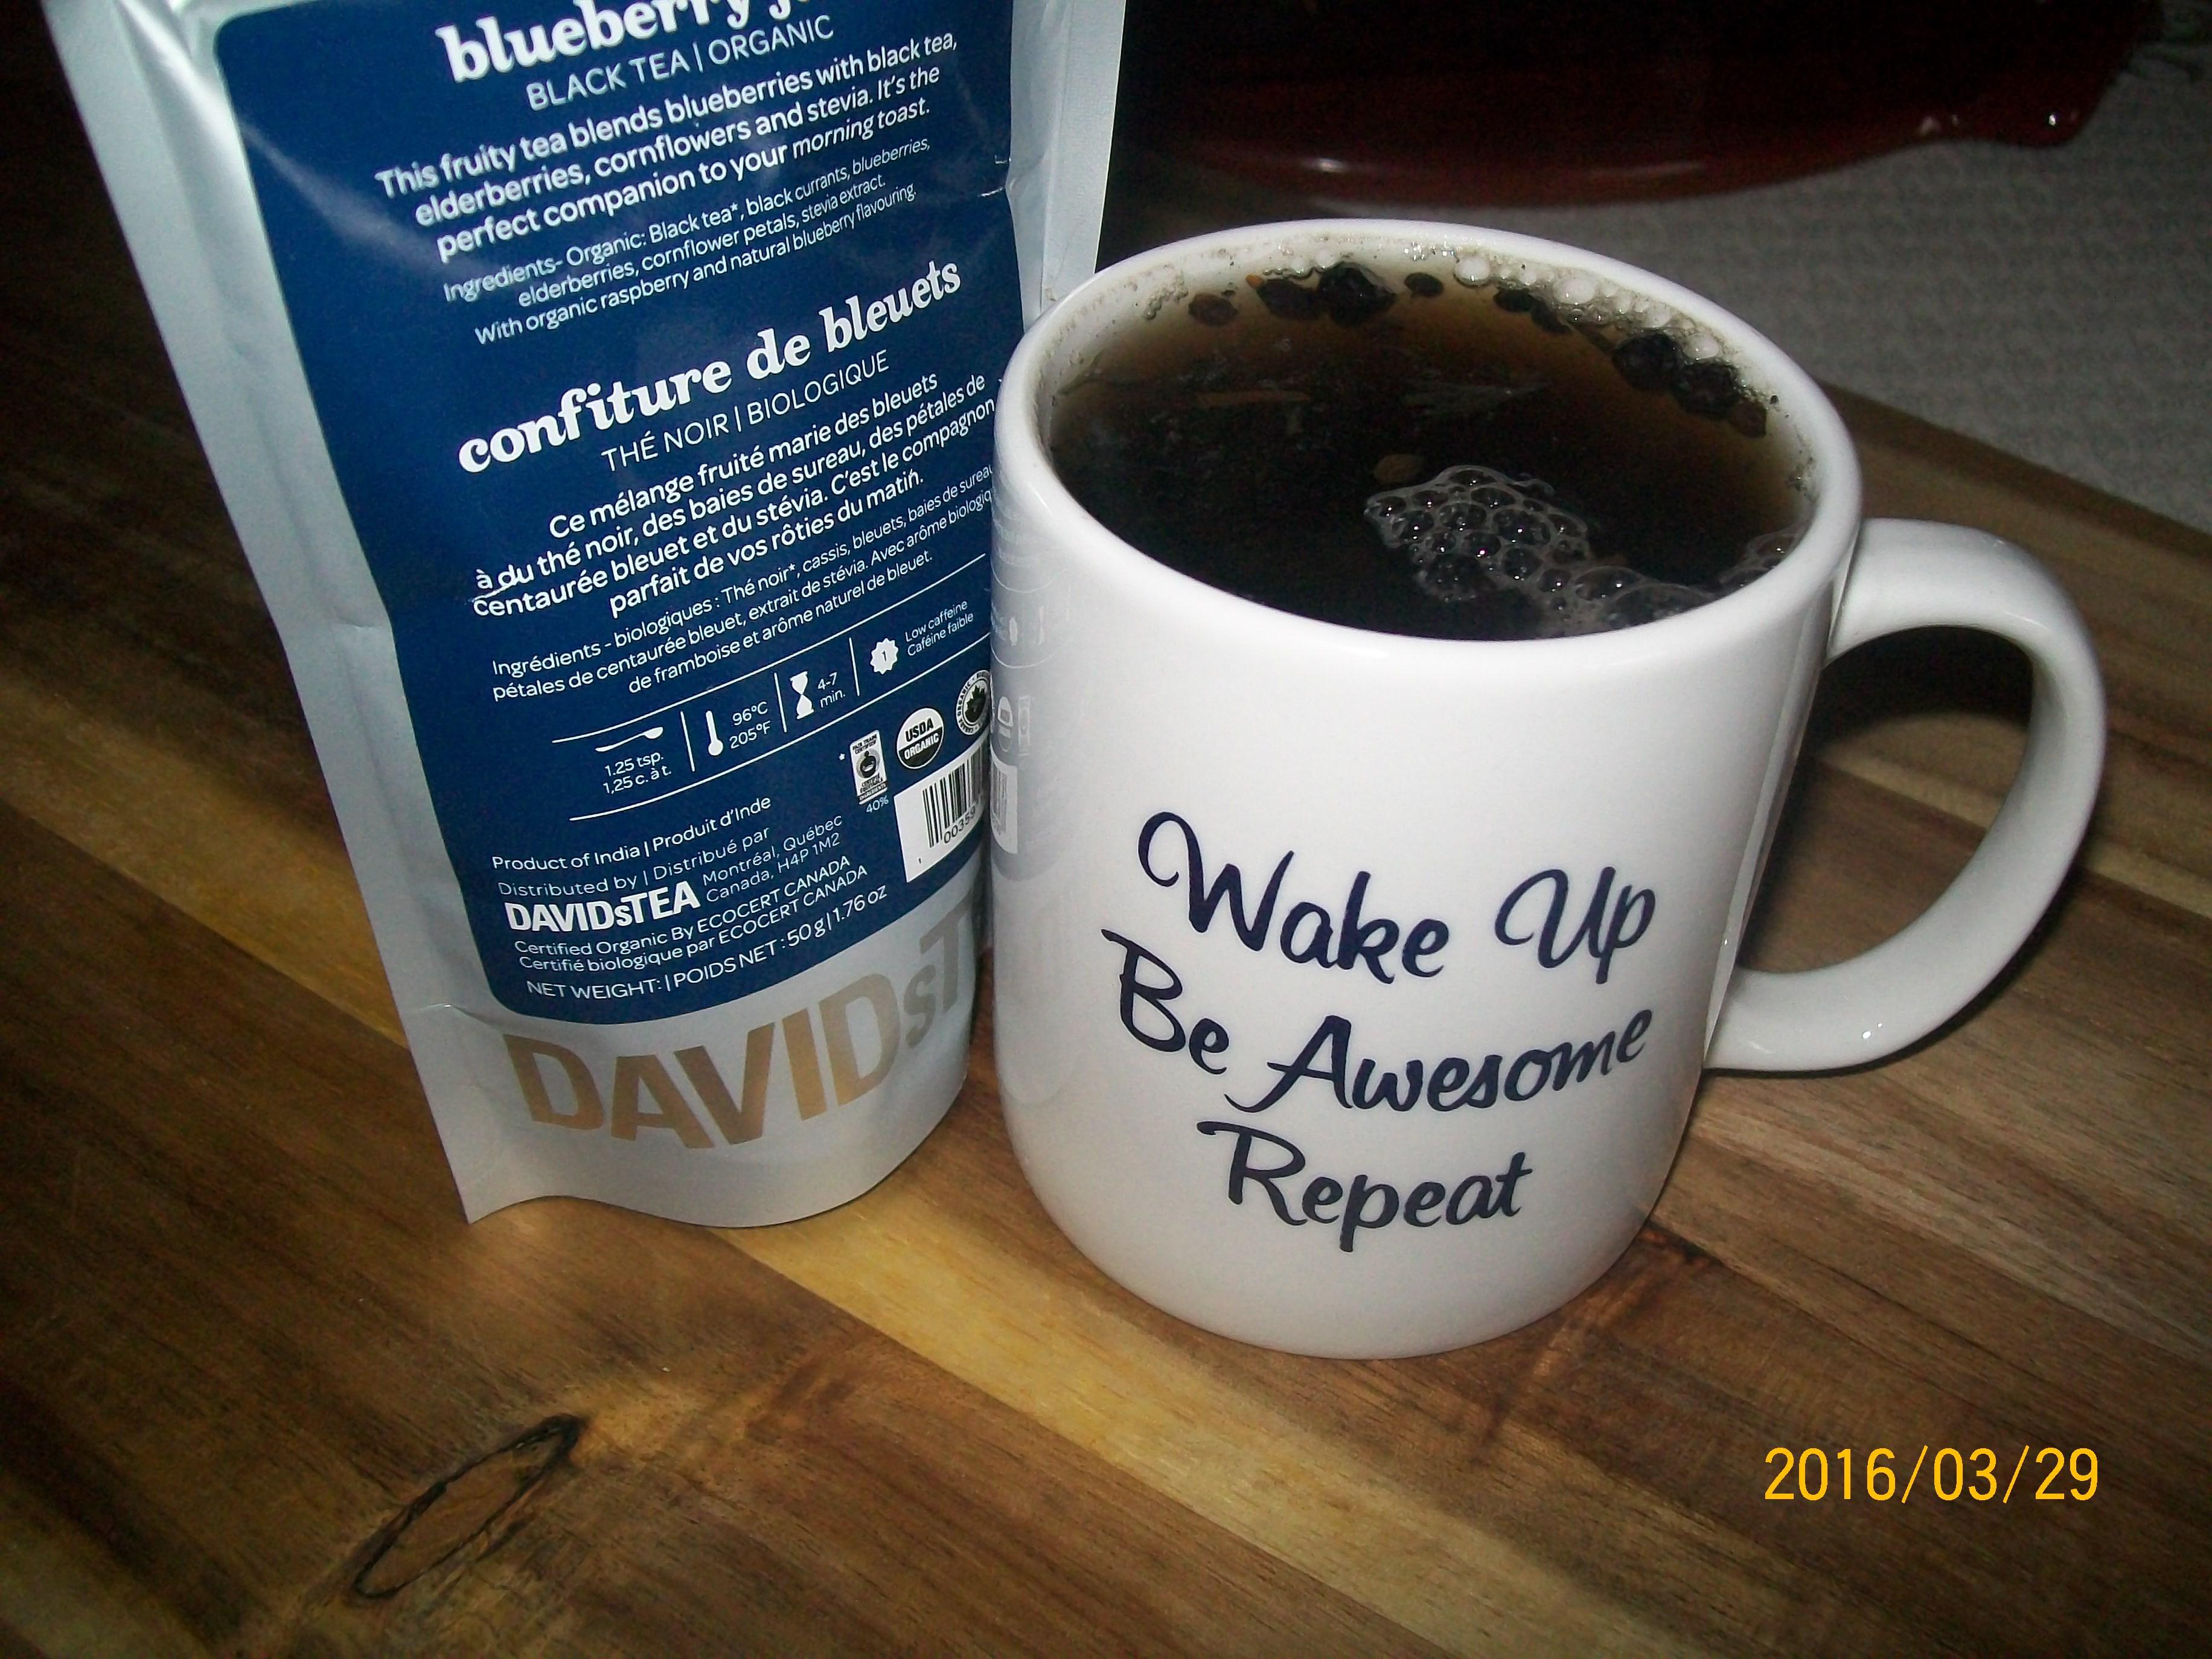 Coffee organic tea - David S Blueberry Jam Loose Black Organic Tea Image Gallery